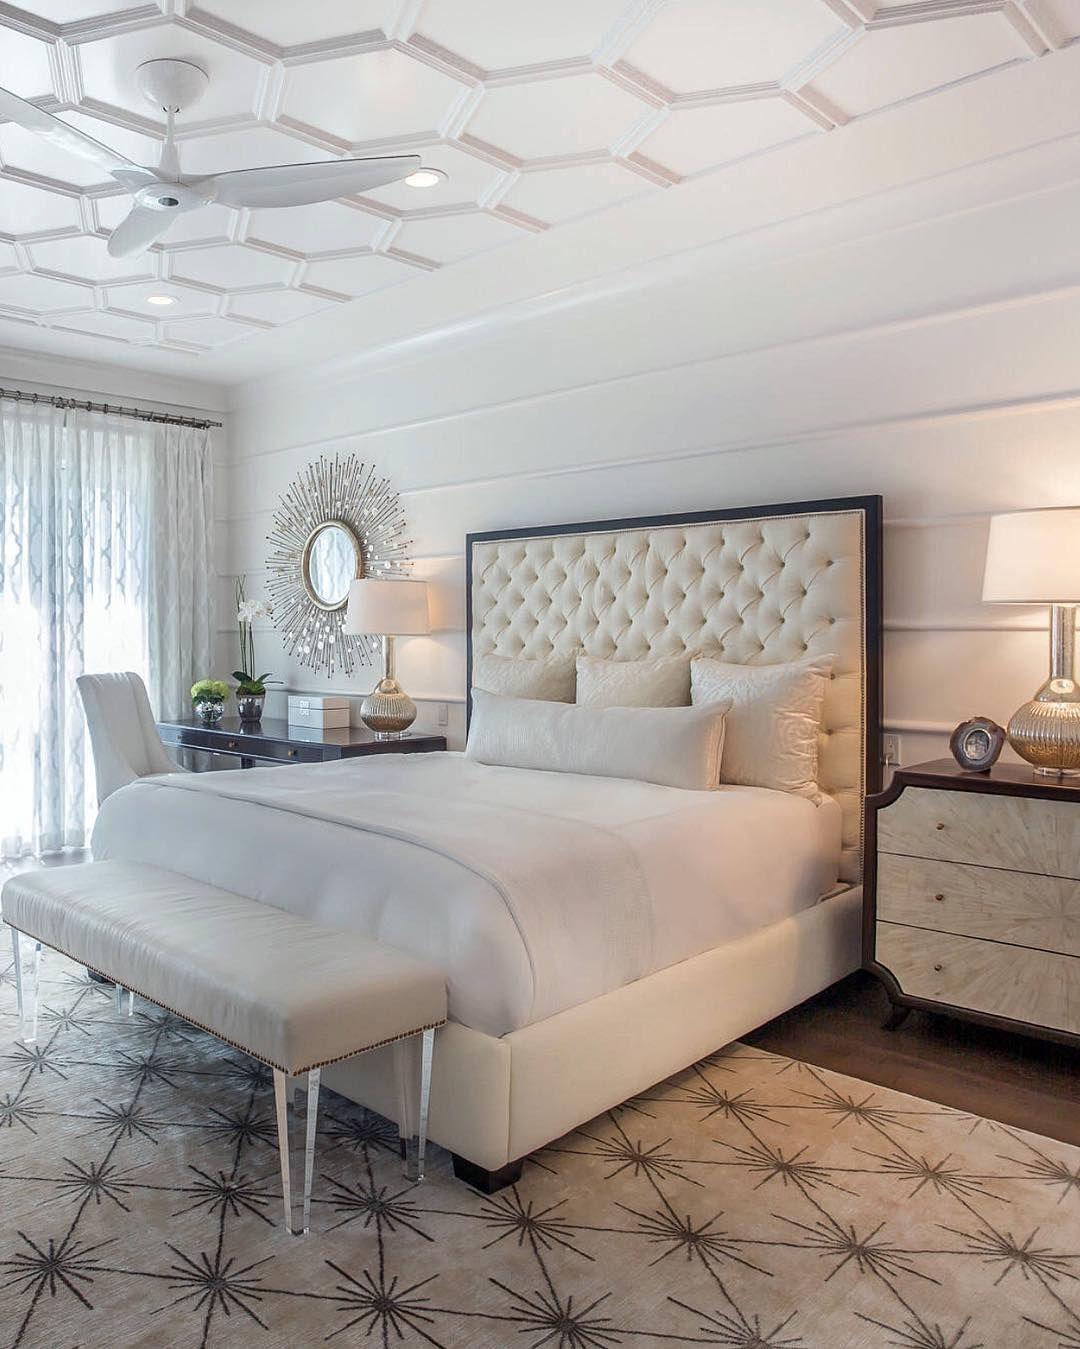 31 Gorgeous Ultra Modern Bedroom Designs Transitional Bedroom Design Transitional Bedroom Bedroom Design Gorgeous transitional style bedroom